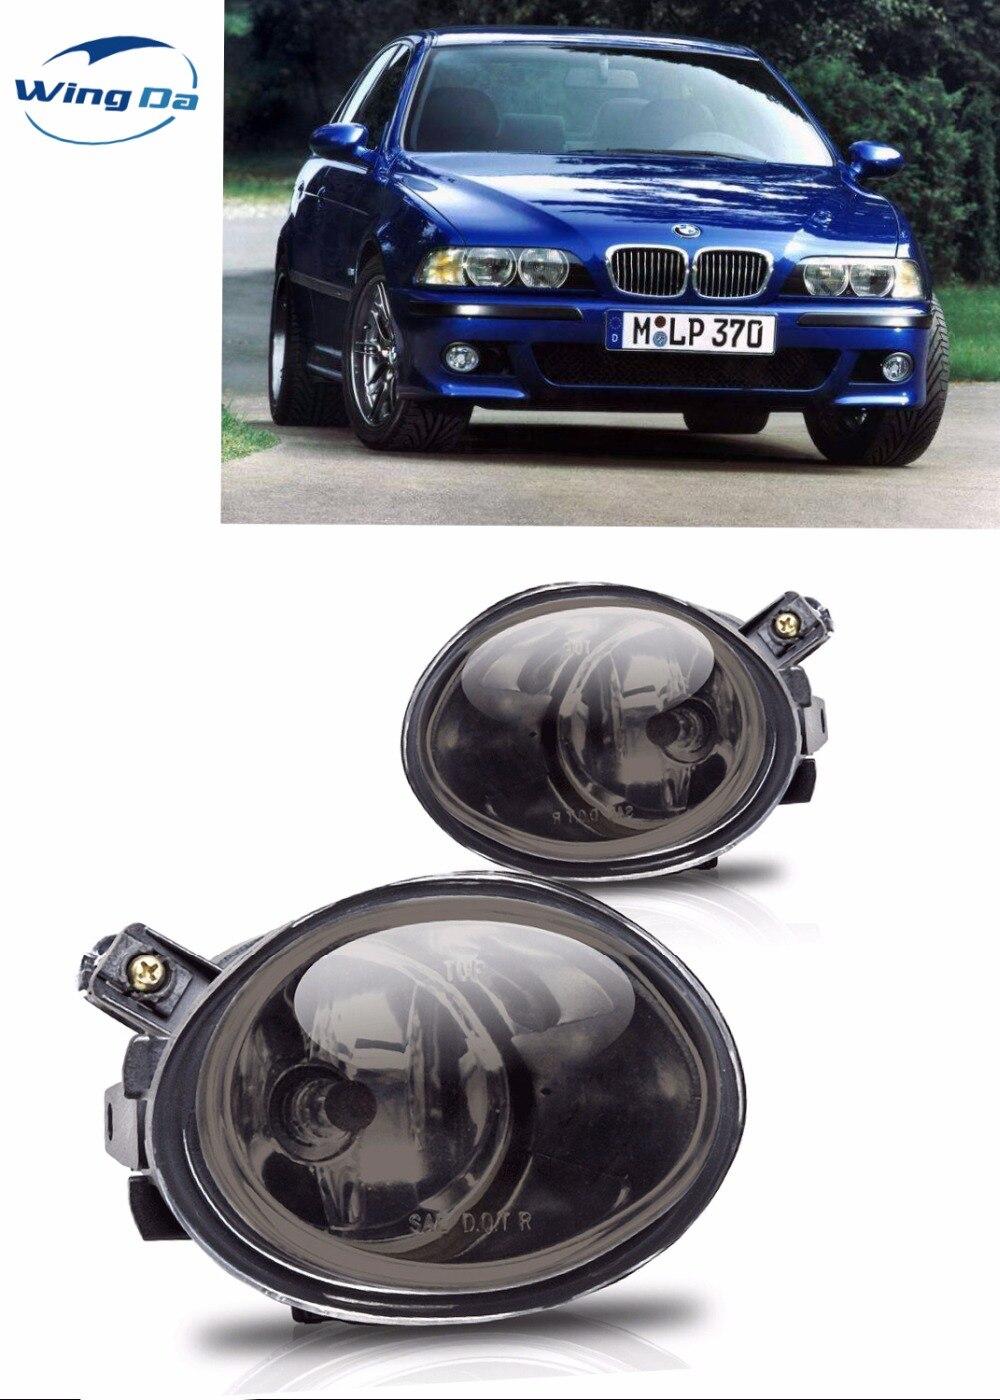 Case for fog lamp BMW E39 M5 1995 2004 Fog light with bulbs Halogen car light